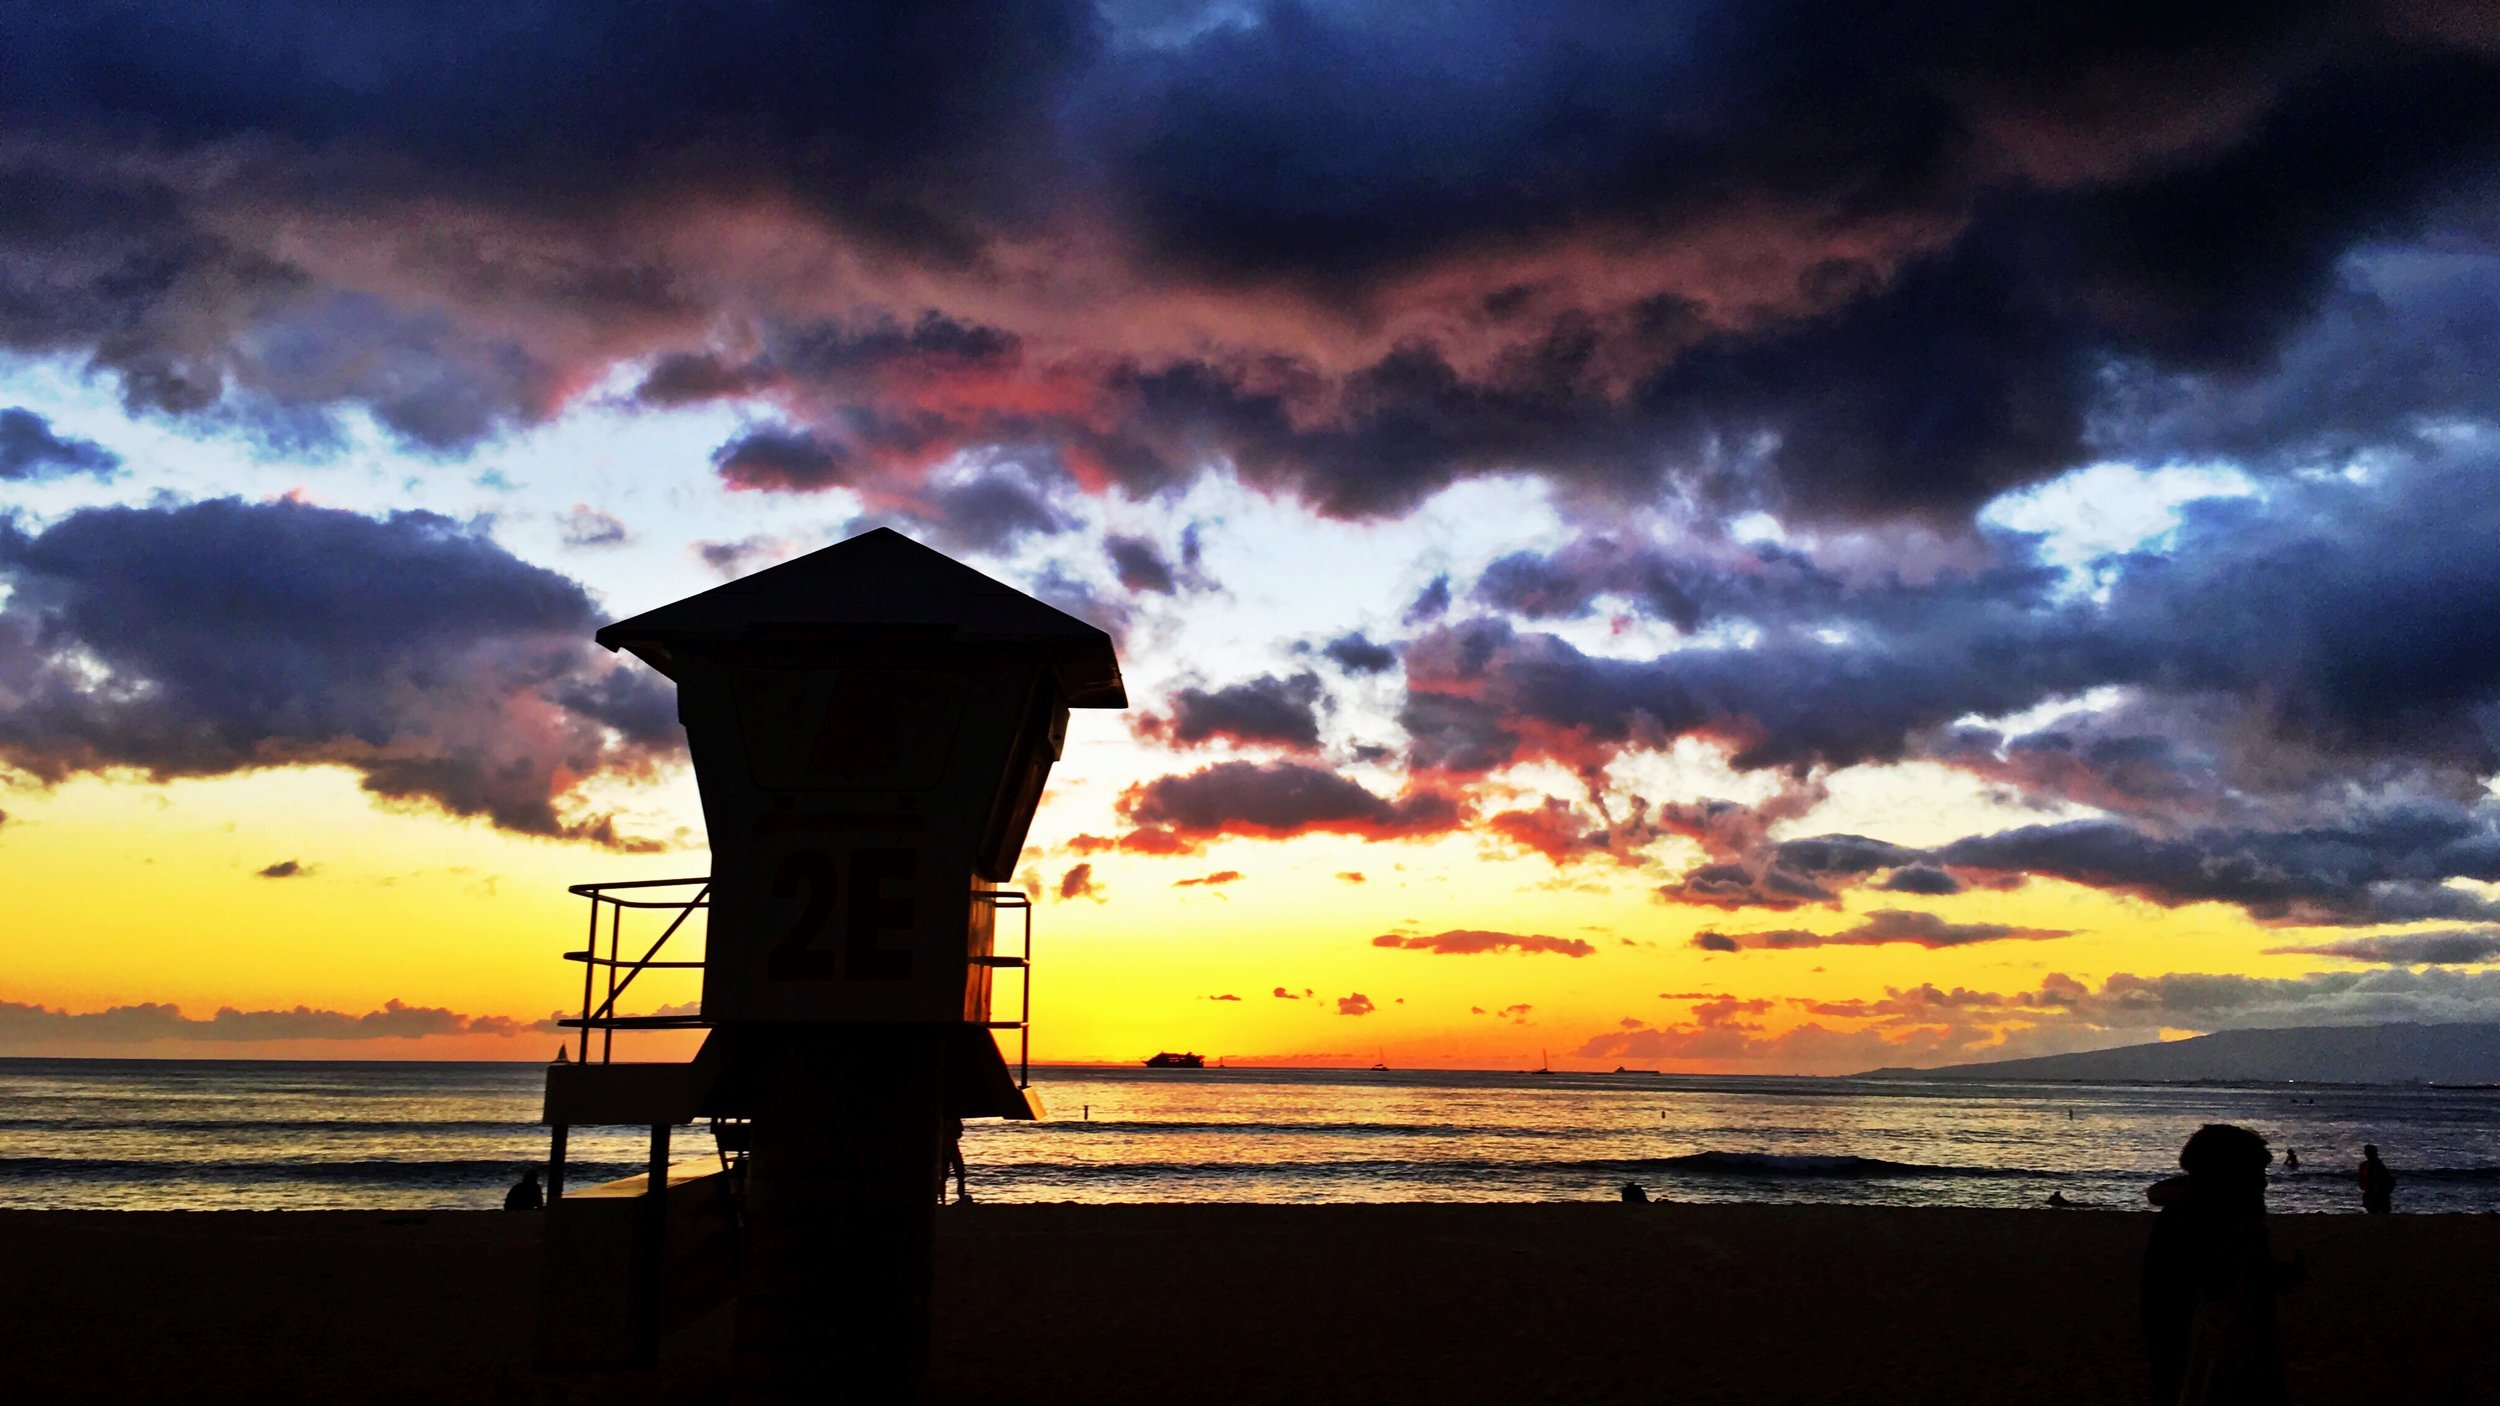 Waikiki beach after sunset, October 2015